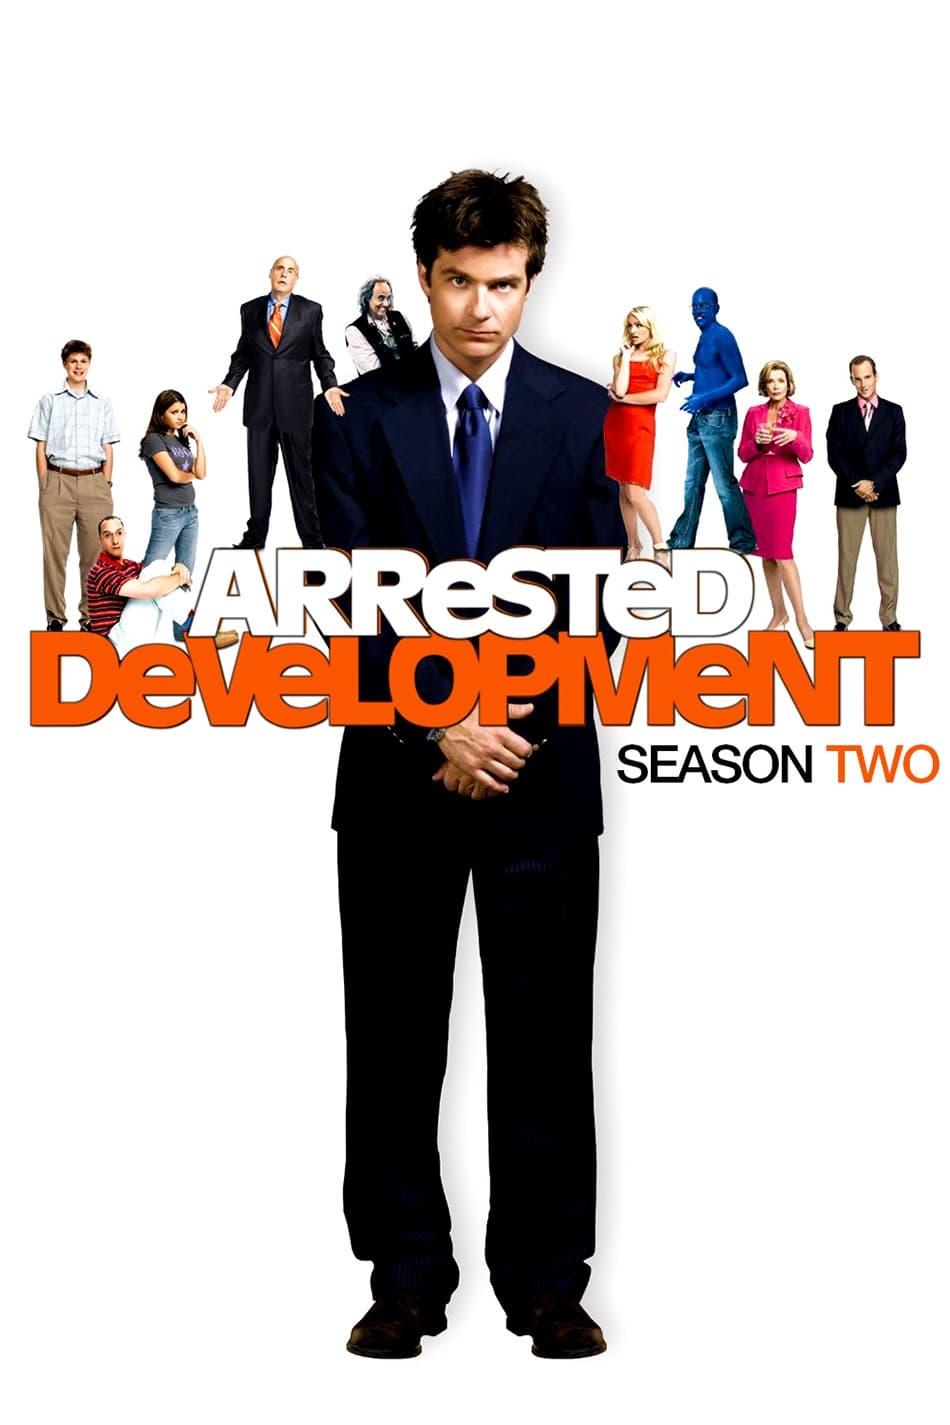 Arrested Development Season 2